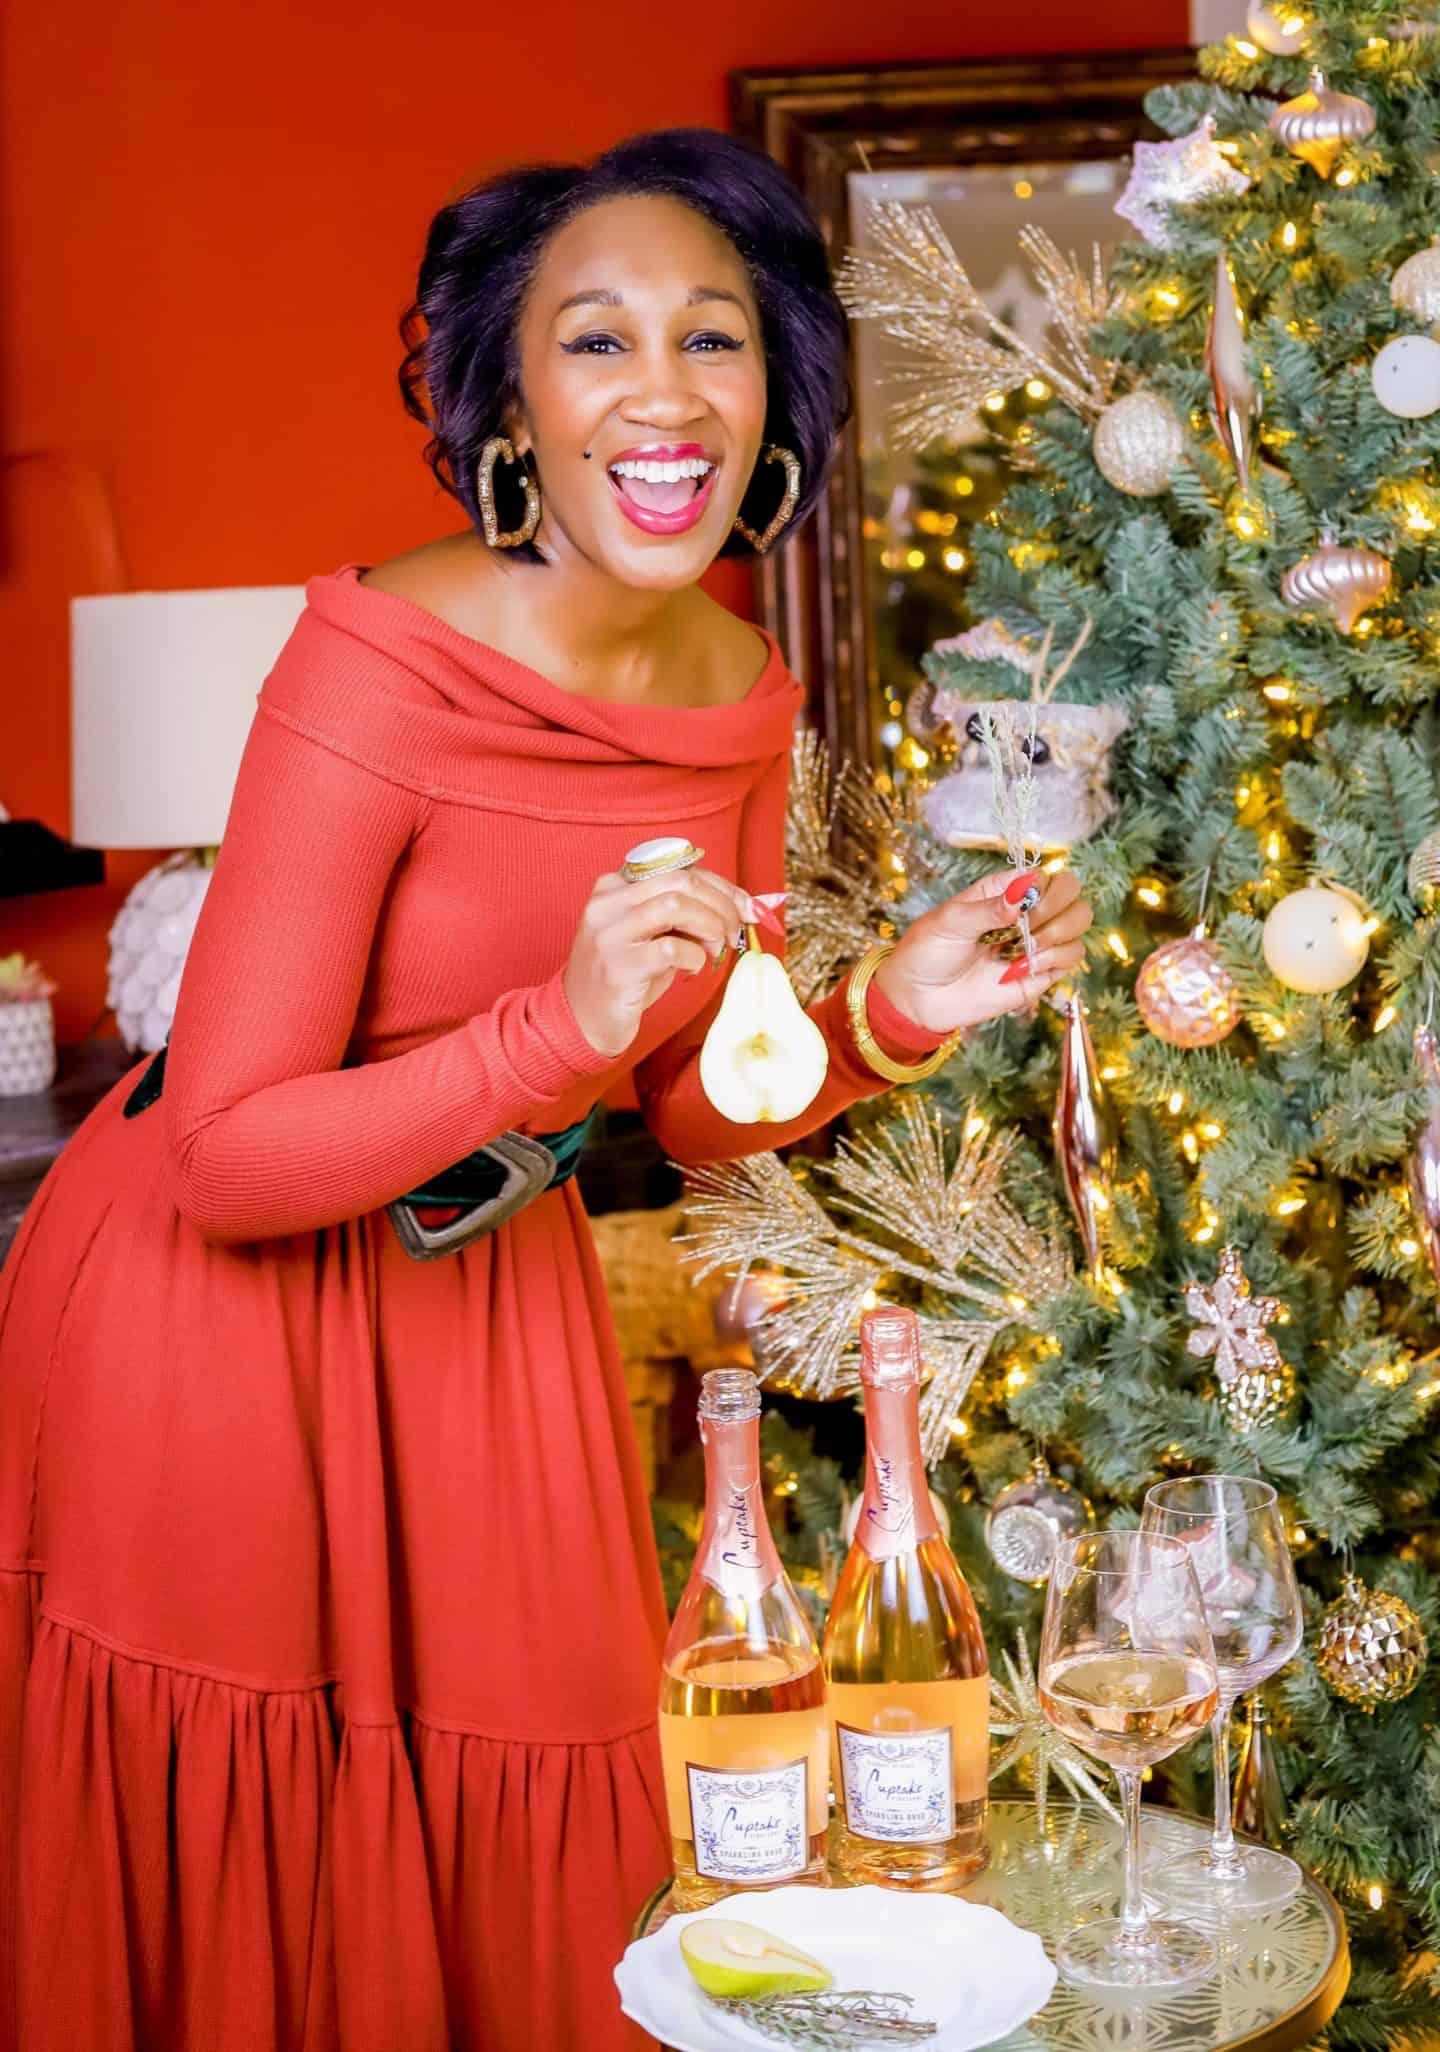 Make This! - The Most Festive Holiday Cocktails | Shaunda Necole